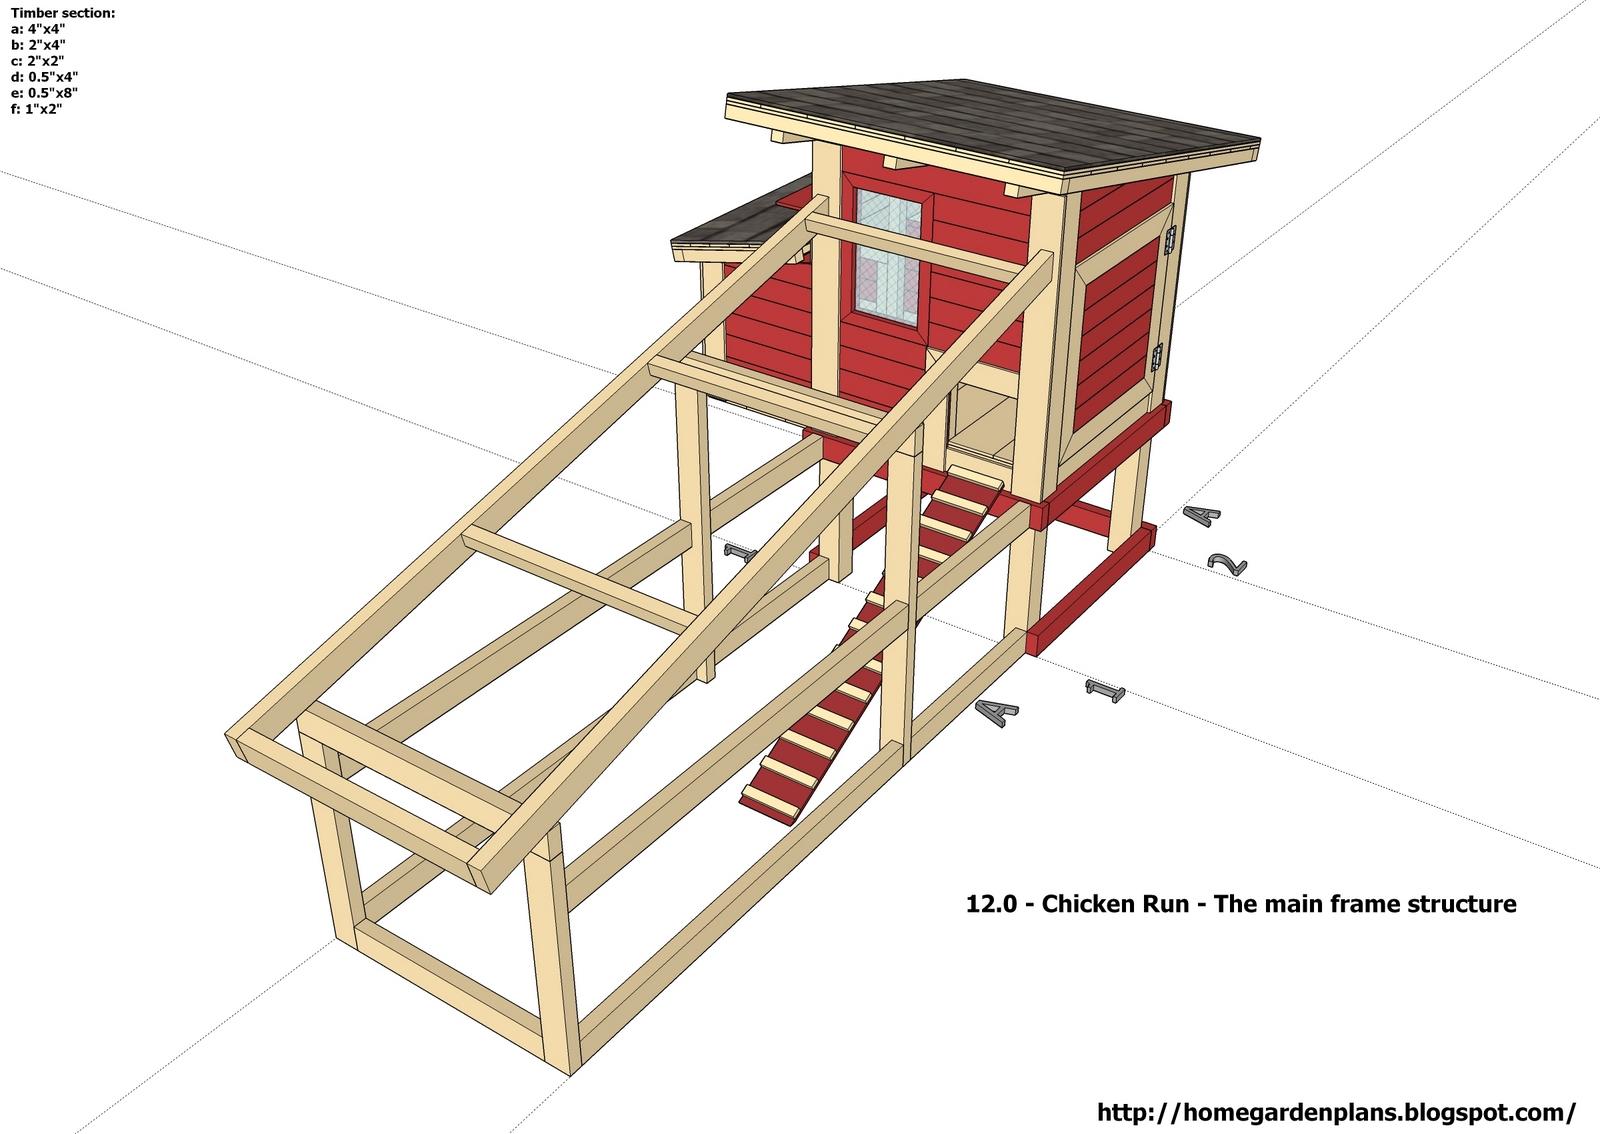 home garden plans: S100 - Small Chicken Coop - Free ...